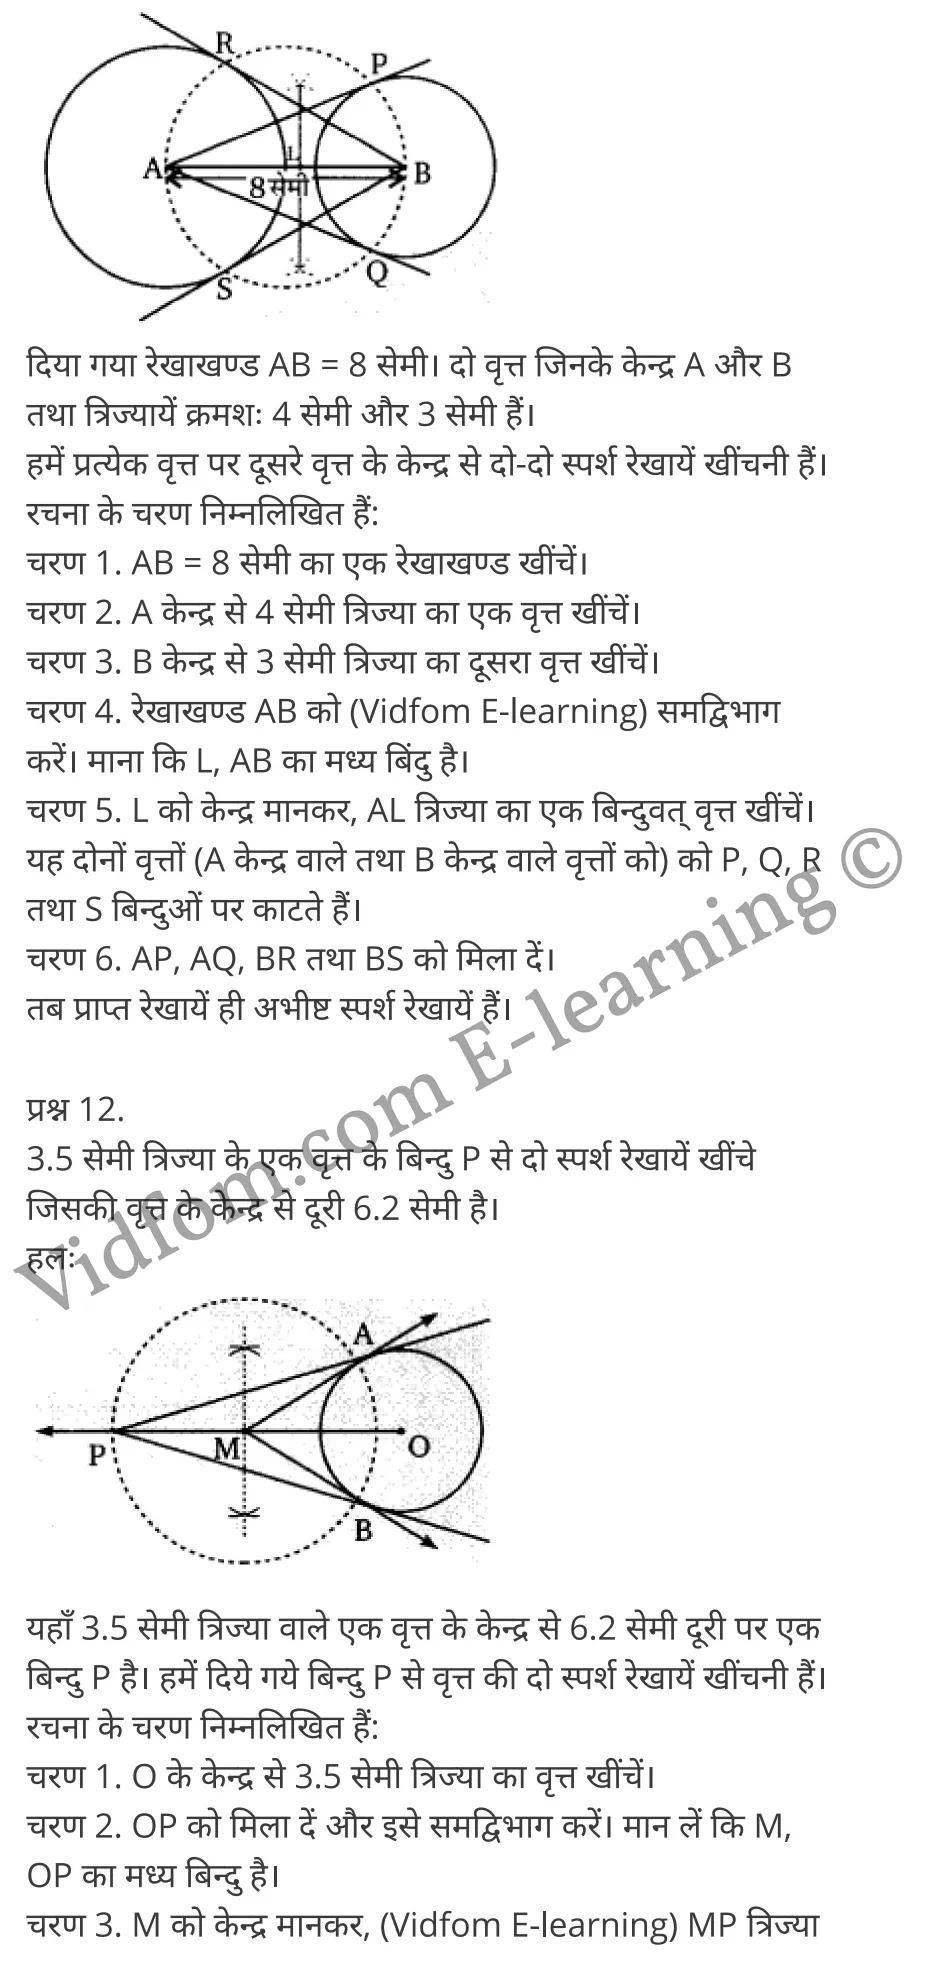 Balaji Maths Book Solutions Class 10 Chapter 9 Constructions (रचनाएँ)  Chapter 9 Constructions Ex 9.1  कक्षा 10 बालाजी गणित  के नोट्स  हिंदी में एनसीईआरटी समाधान,     class 10 Balaji Maths Chapter 9,   class 10 Balaji Maths Chapter 9 ncert solutions in Hindi,   class 10 Balaji Maths Chapter 9 notes in hindi,   class 10 Balaji Maths Chapter 9 question answer,   class 10 Balaji Maths Chapter 9 notes,   class 10 Balaji Maths Chapter 9 class 10 Balaji Maths Chapter 9 in  hindi,    class 10 Balaji Maths Chapter 9 important questions in  hindi,   class 10 Balaji Maths Chapter 9 notes in hindi,    class 10 Balaji Maths Chapter 9 test,   class 10 Balaji Maths Chapter 9 pdf,   class 10 Balaji Maths Chapter 9 notes pdf,   class 10 Balaji Maths Chapter 9 exercise solutions,   class 10 Balaji Maths Chapter 9 notes study rankers,   class 10 Balaji Maths Chapter 9 notes,    class 10 Balaji Maths Chapter 9  class 10  notes pdf,   class 10 Balaji Maths Chapter 9 class 10  notes  ncert,   class 10 Balaji Maths Chapter 9 class 10 pdf,   class 10 Balaji Maths Chapter 9  book,   class 10 Balaji Maths Chapter 9 quiz class 10  ,    10  th class 10 Balaji Maths Chapter 9  book up board,   up board 10  th class 10 Balaji Maths Chapter 9 notes,  class 10 Balaji Maths,   class 10 Balaji Maths ncert solutions in Hindi,   class 10 Balaji Maths notes in hindi,   class 10 Balaji Maths question answer,   class 10 Balaji Maths notes,  class 10 Balaji Maths class 10 Balaji Maths Chapter 9 in  hindi,    class 10 Balaji Maths important questions in  hindi,   class 10 Balaji Maths notes in hindi,    class 10 Balaji Maths test,  class 10 Balaji Maths class 10 Balaji Maths Chapter 9 pdf,   class 10 Balaji Maths notes pdf,   class 10 Balaji Maths exercise solutions,   class 10 Balaji Maths,  class 10 Balaji Maths notes study rankers,   class 10 Balaji Maths notes,  class 10 Balaji Maths notes,   class 10 Balaji Maths  class 10  notes pdf,   class 10 Balaji Maths class 10  notes  ncert,   class 10 Balaji 